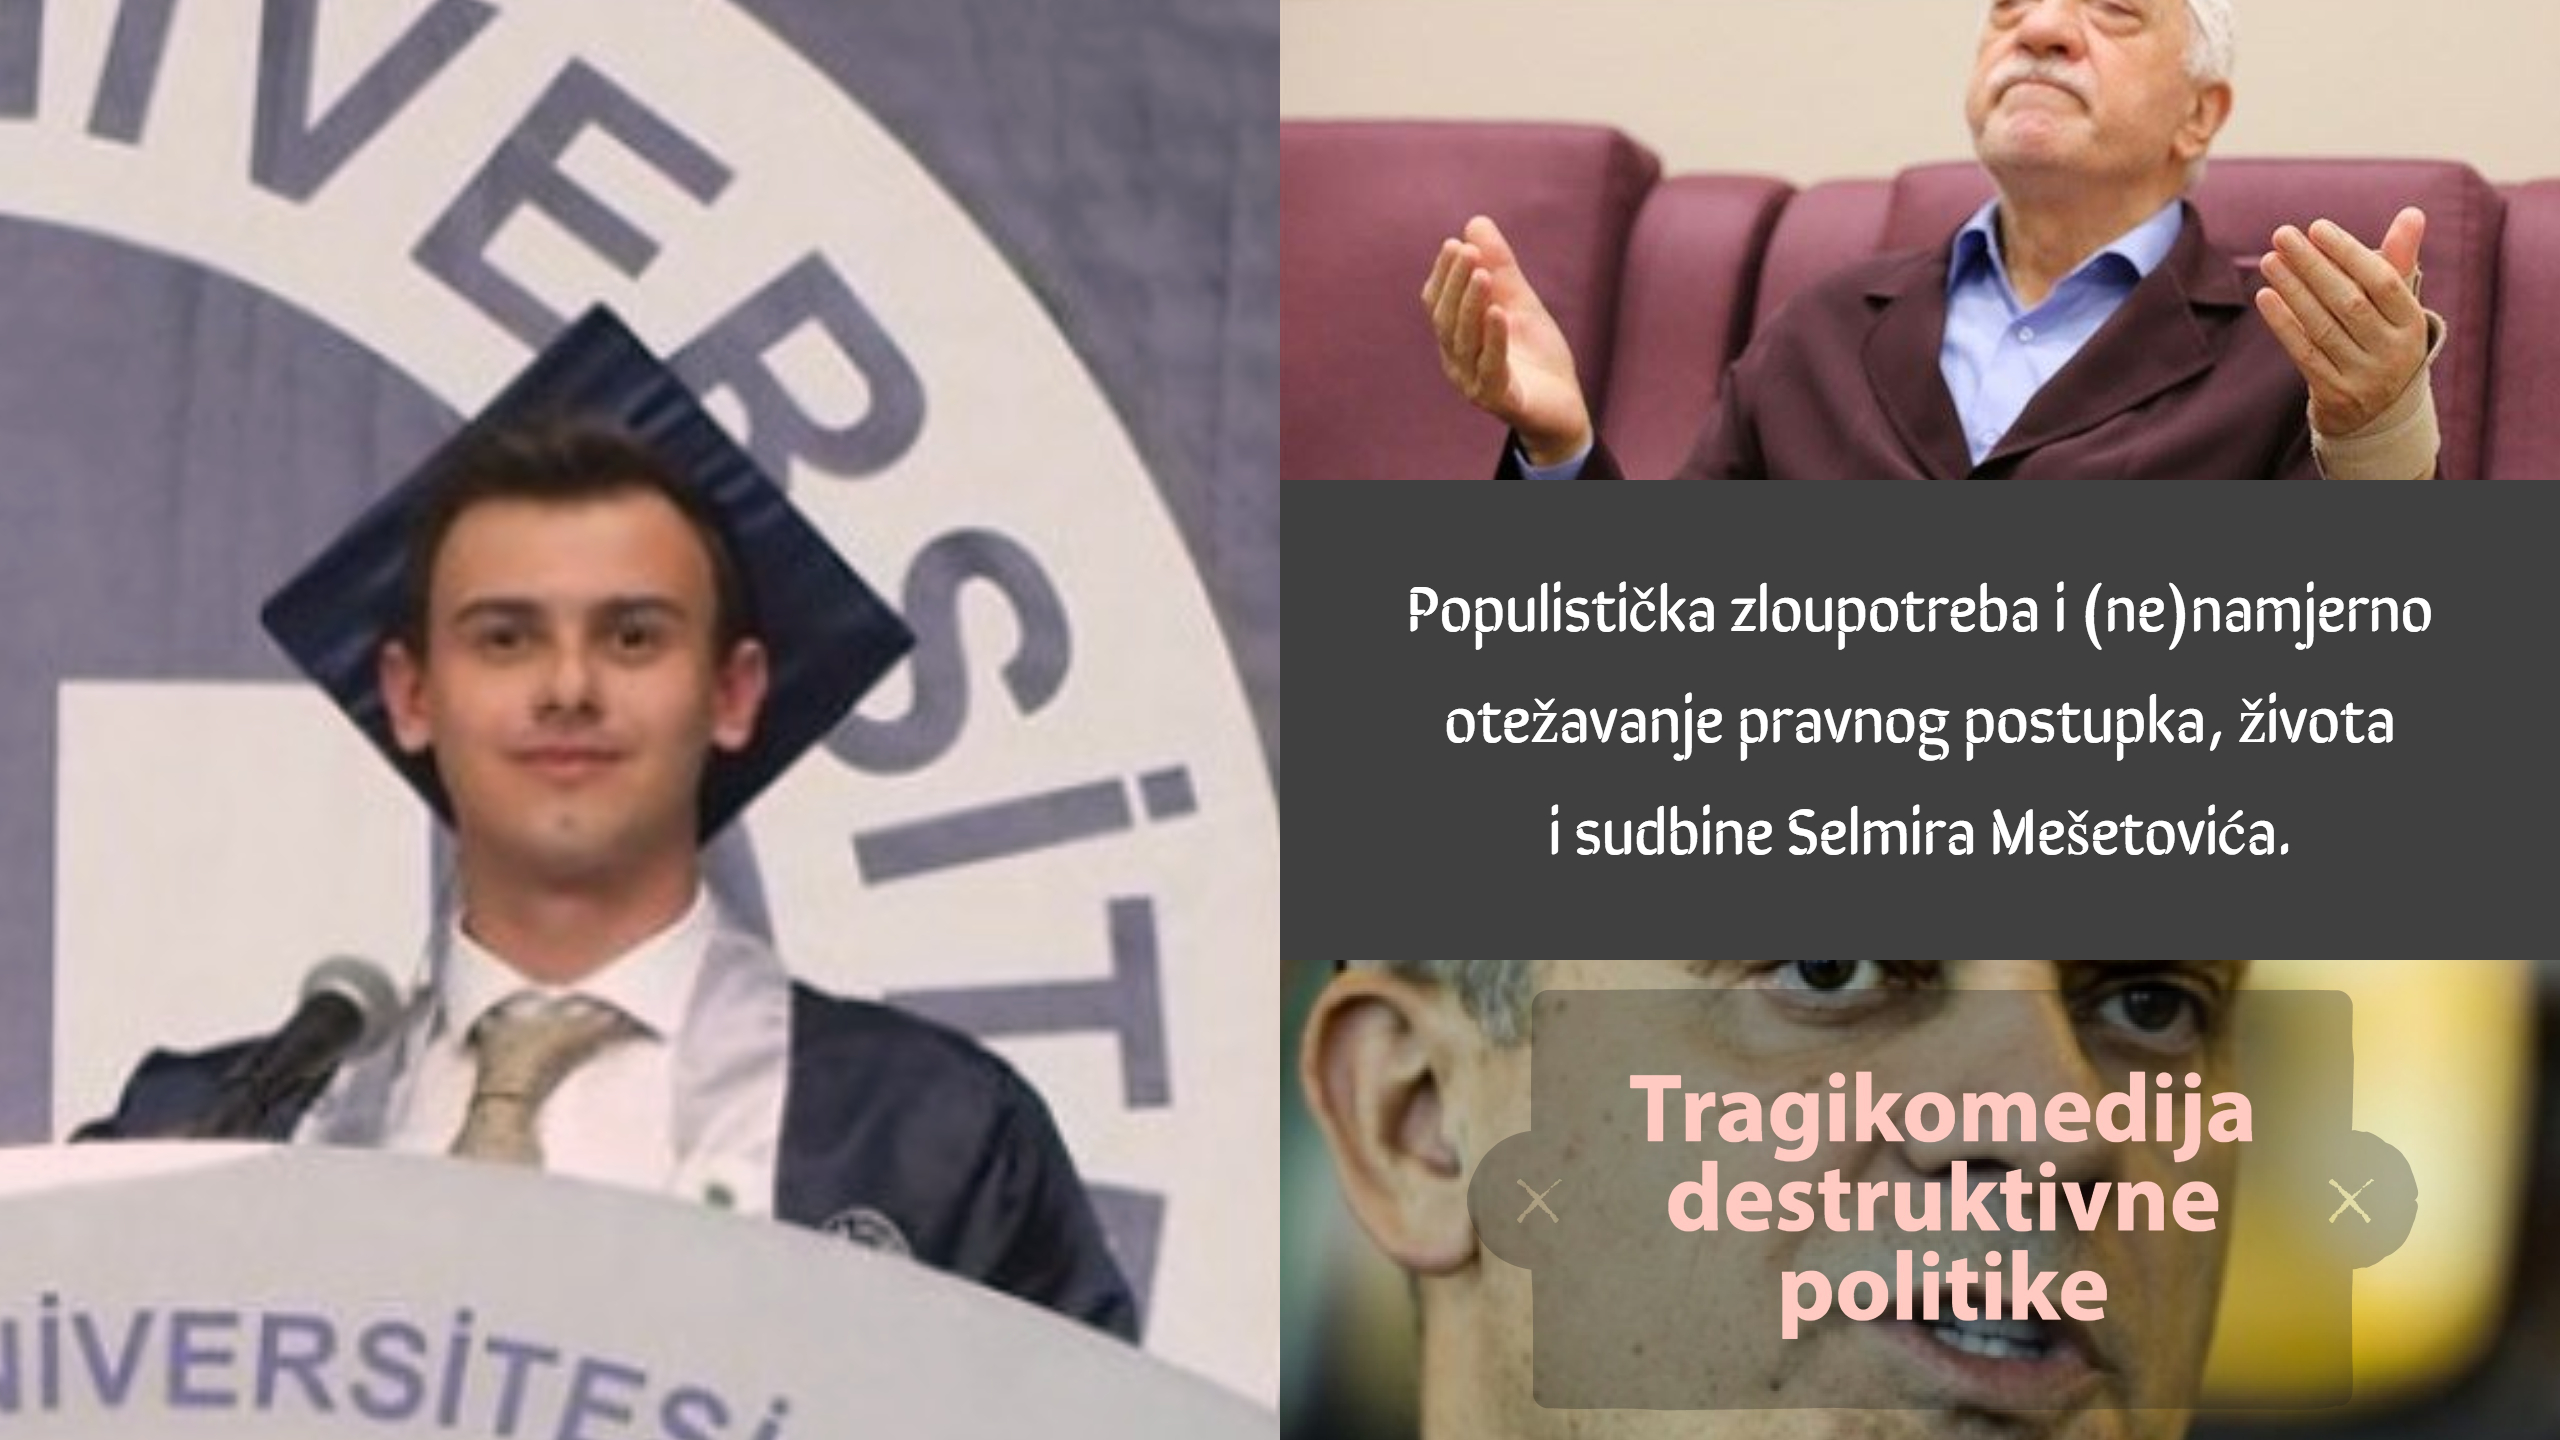 Fetoizacija studenta: Selmir Mešetović je od strane FR-a doveden u opasnost